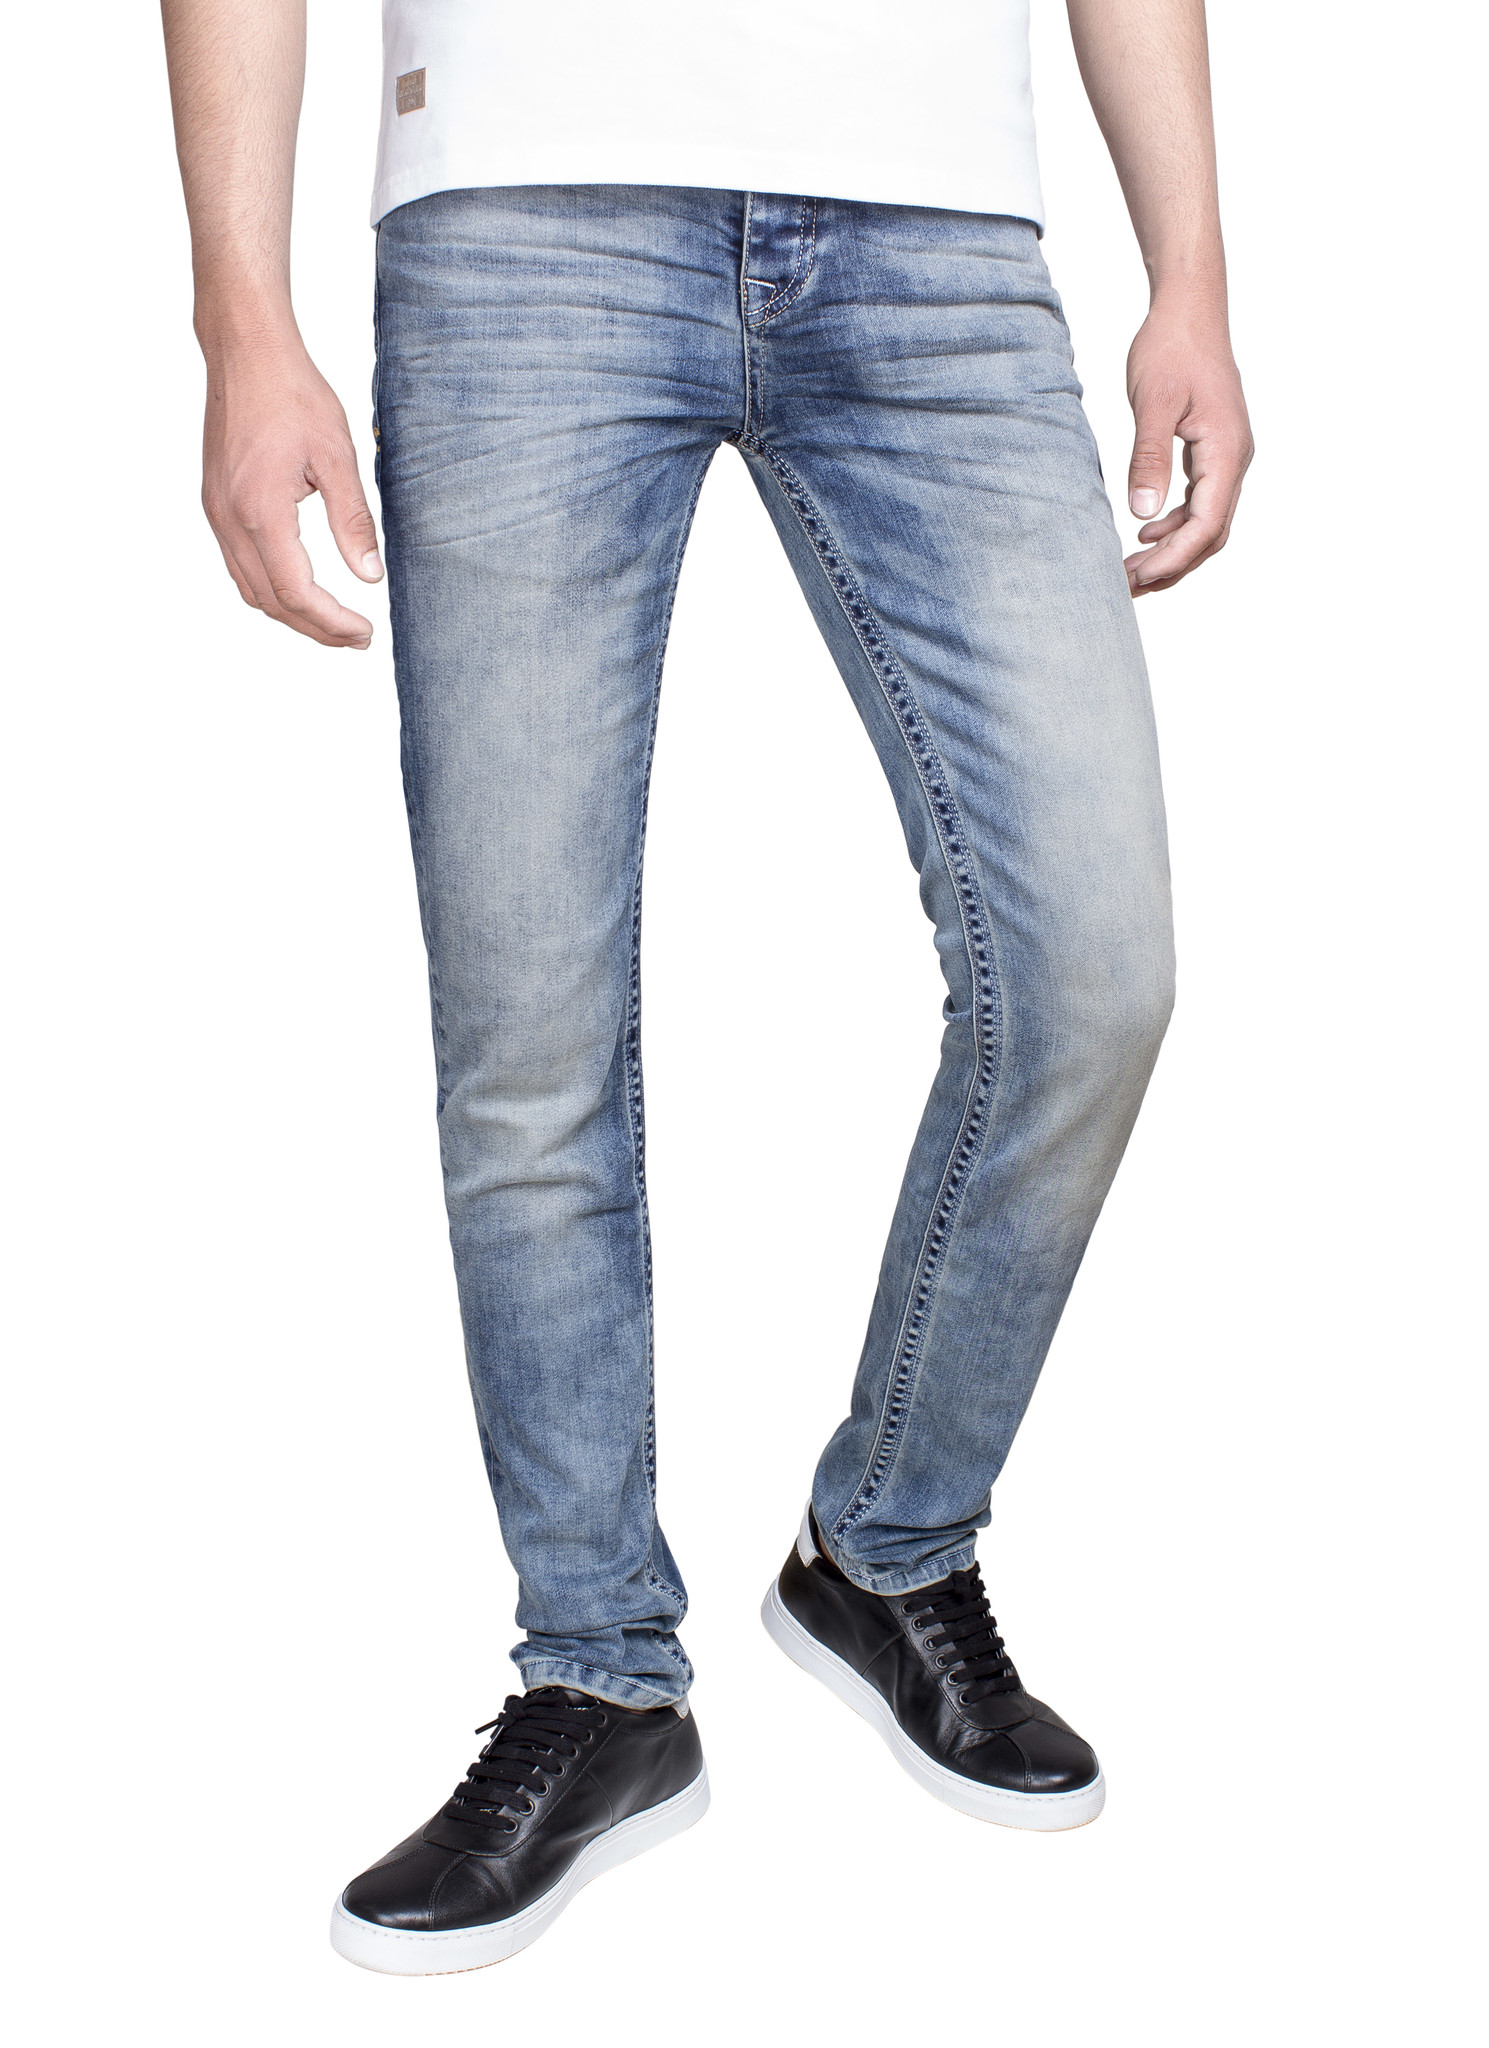 Wam Denim Jeans 72084 Dark Blue